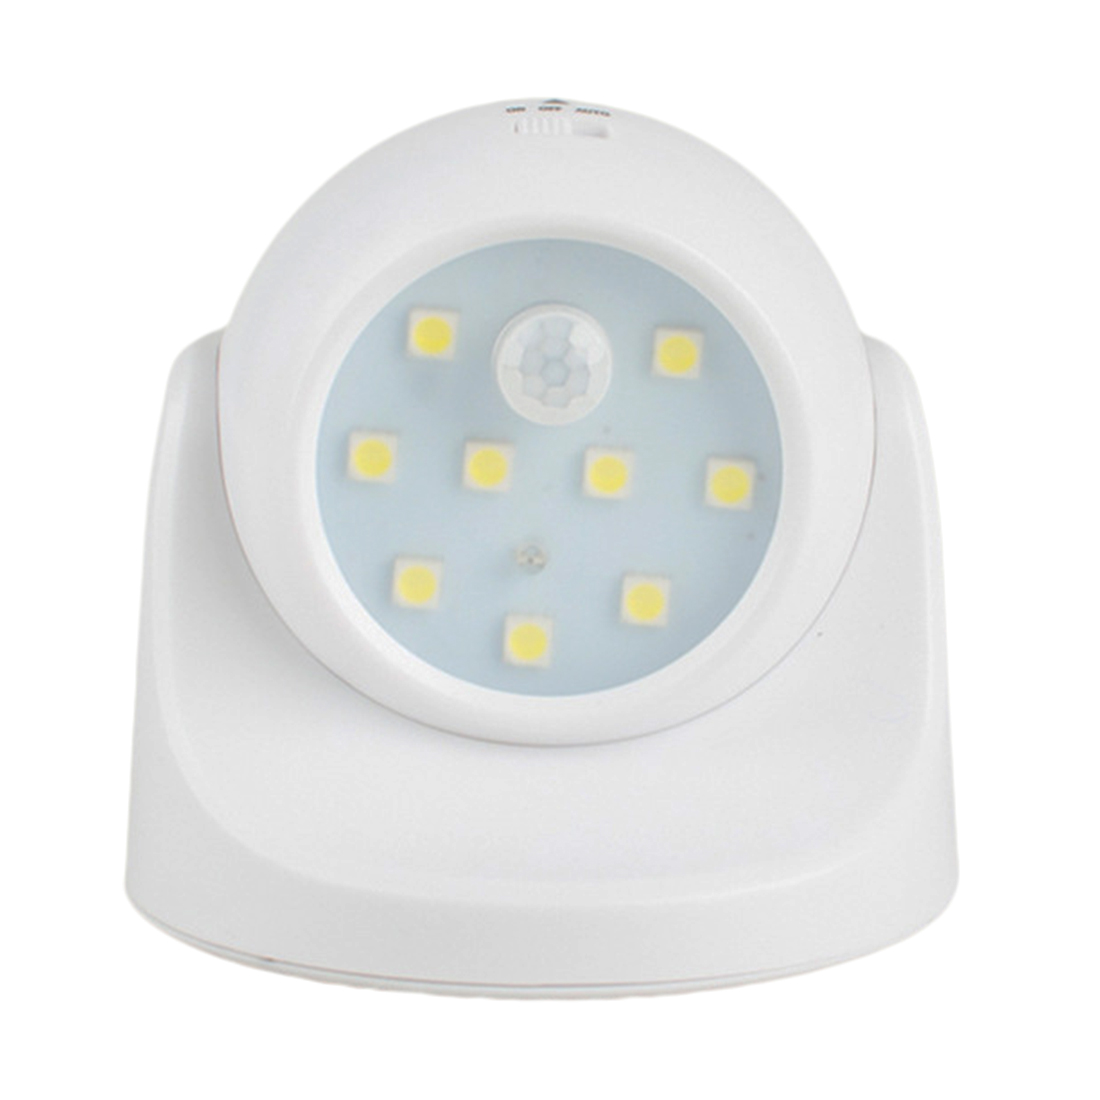 Portable 9 LED Motion Sensor Night Light 360 Degree Rotation Night Light Auto IR Infrared Luminary Lamp Children Lamp LED sn101 mini 360 degree rotation 0 1w yellow light auto sensor night lamp white 2 round pin plug